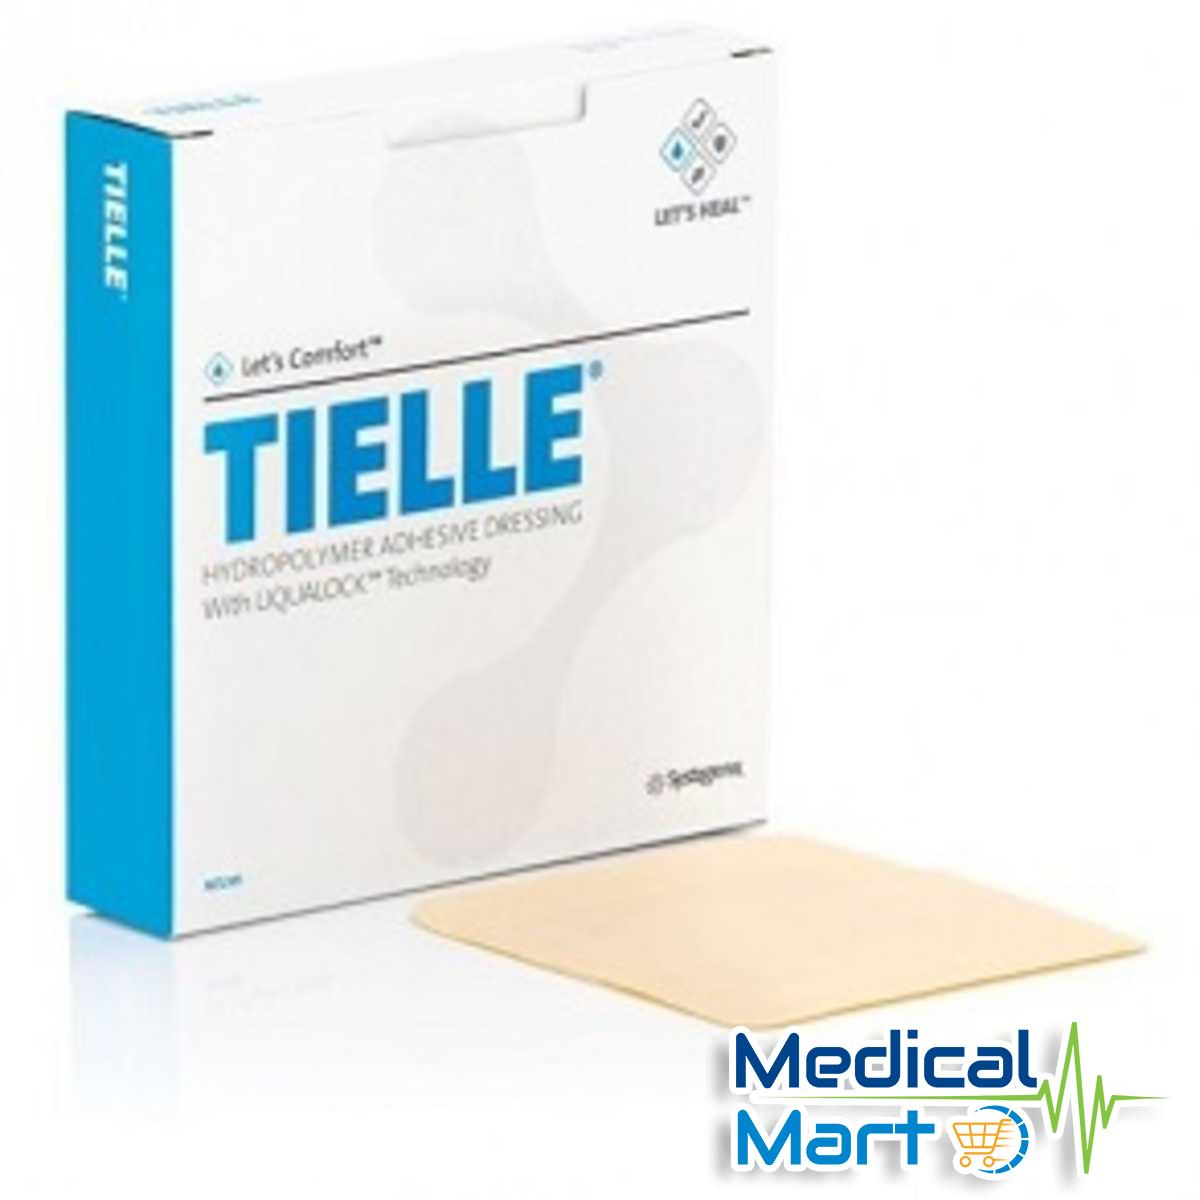 Tielle Hydropolymer Adhesive Wound Dressing, 15cm x 10cm